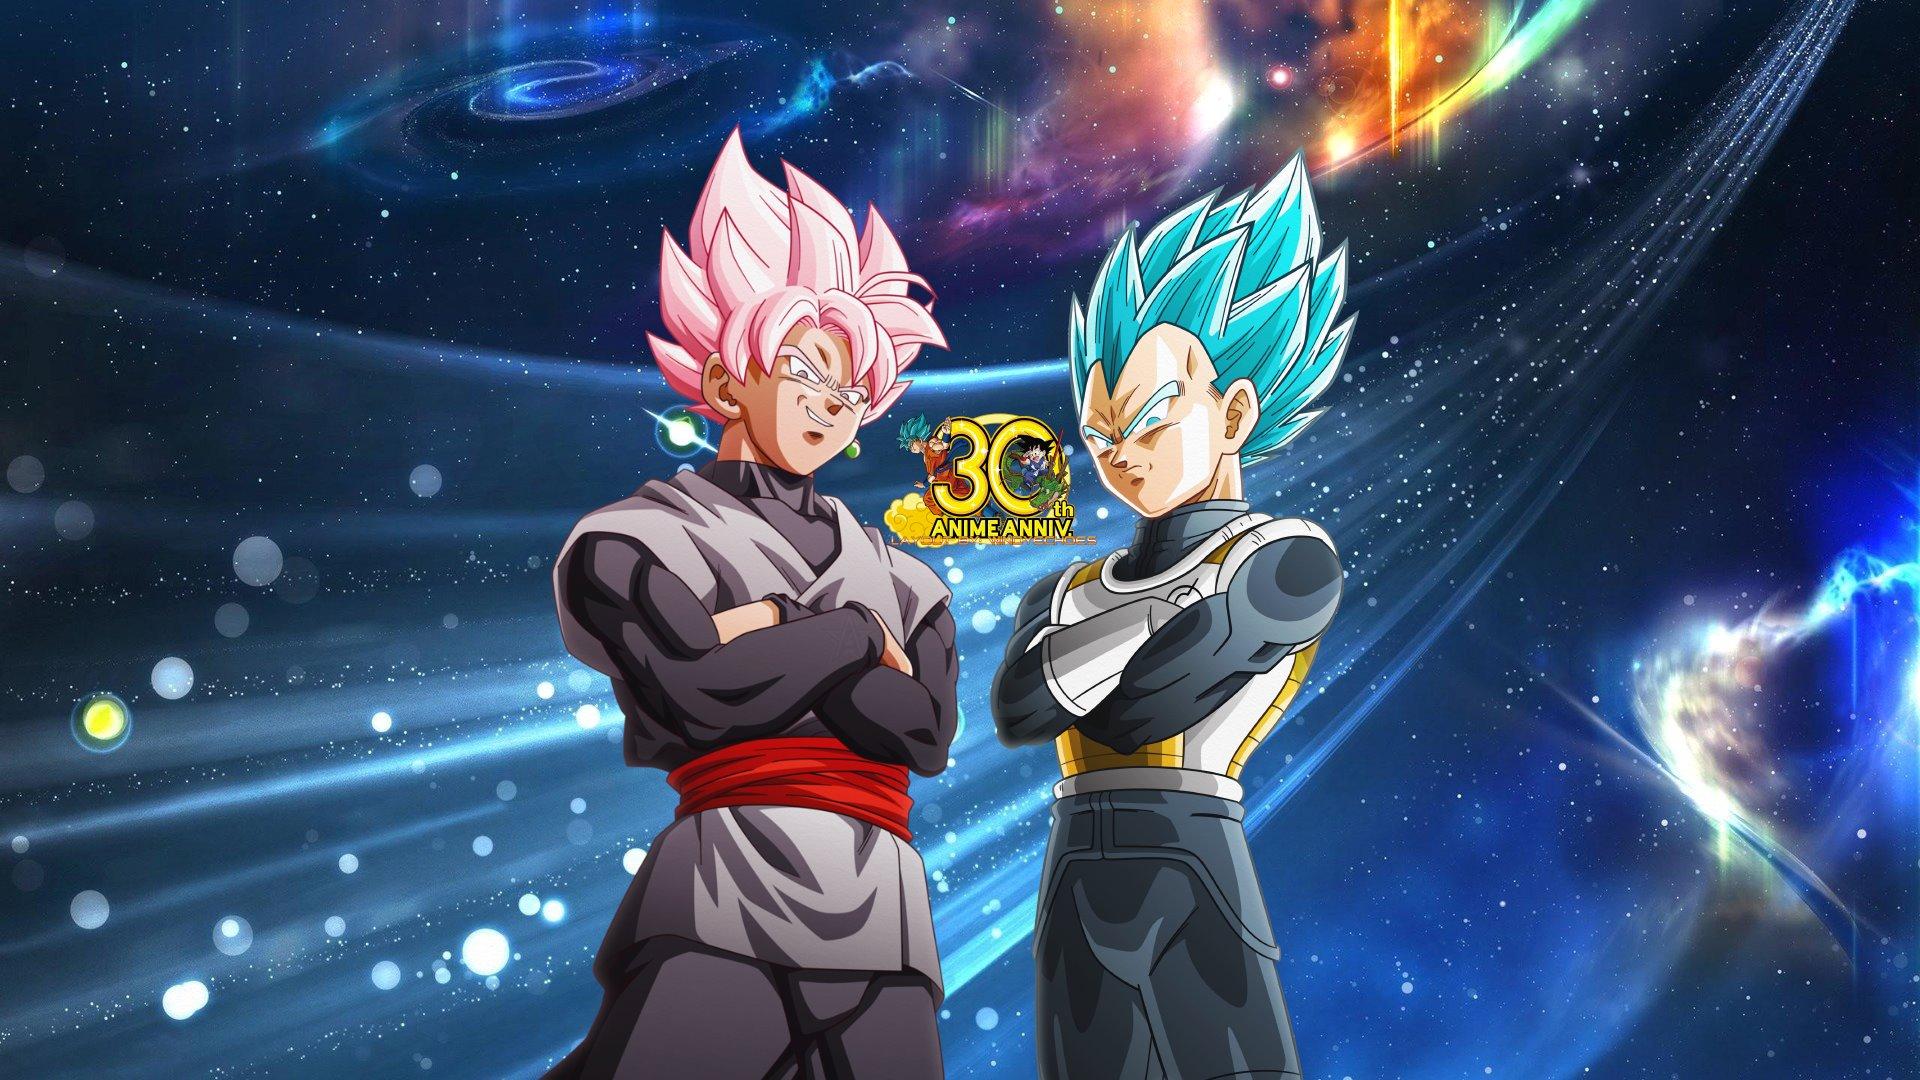 Goku Black And Vegeta Dbs Wallpaper Hd By Windyechoes On Deviantart